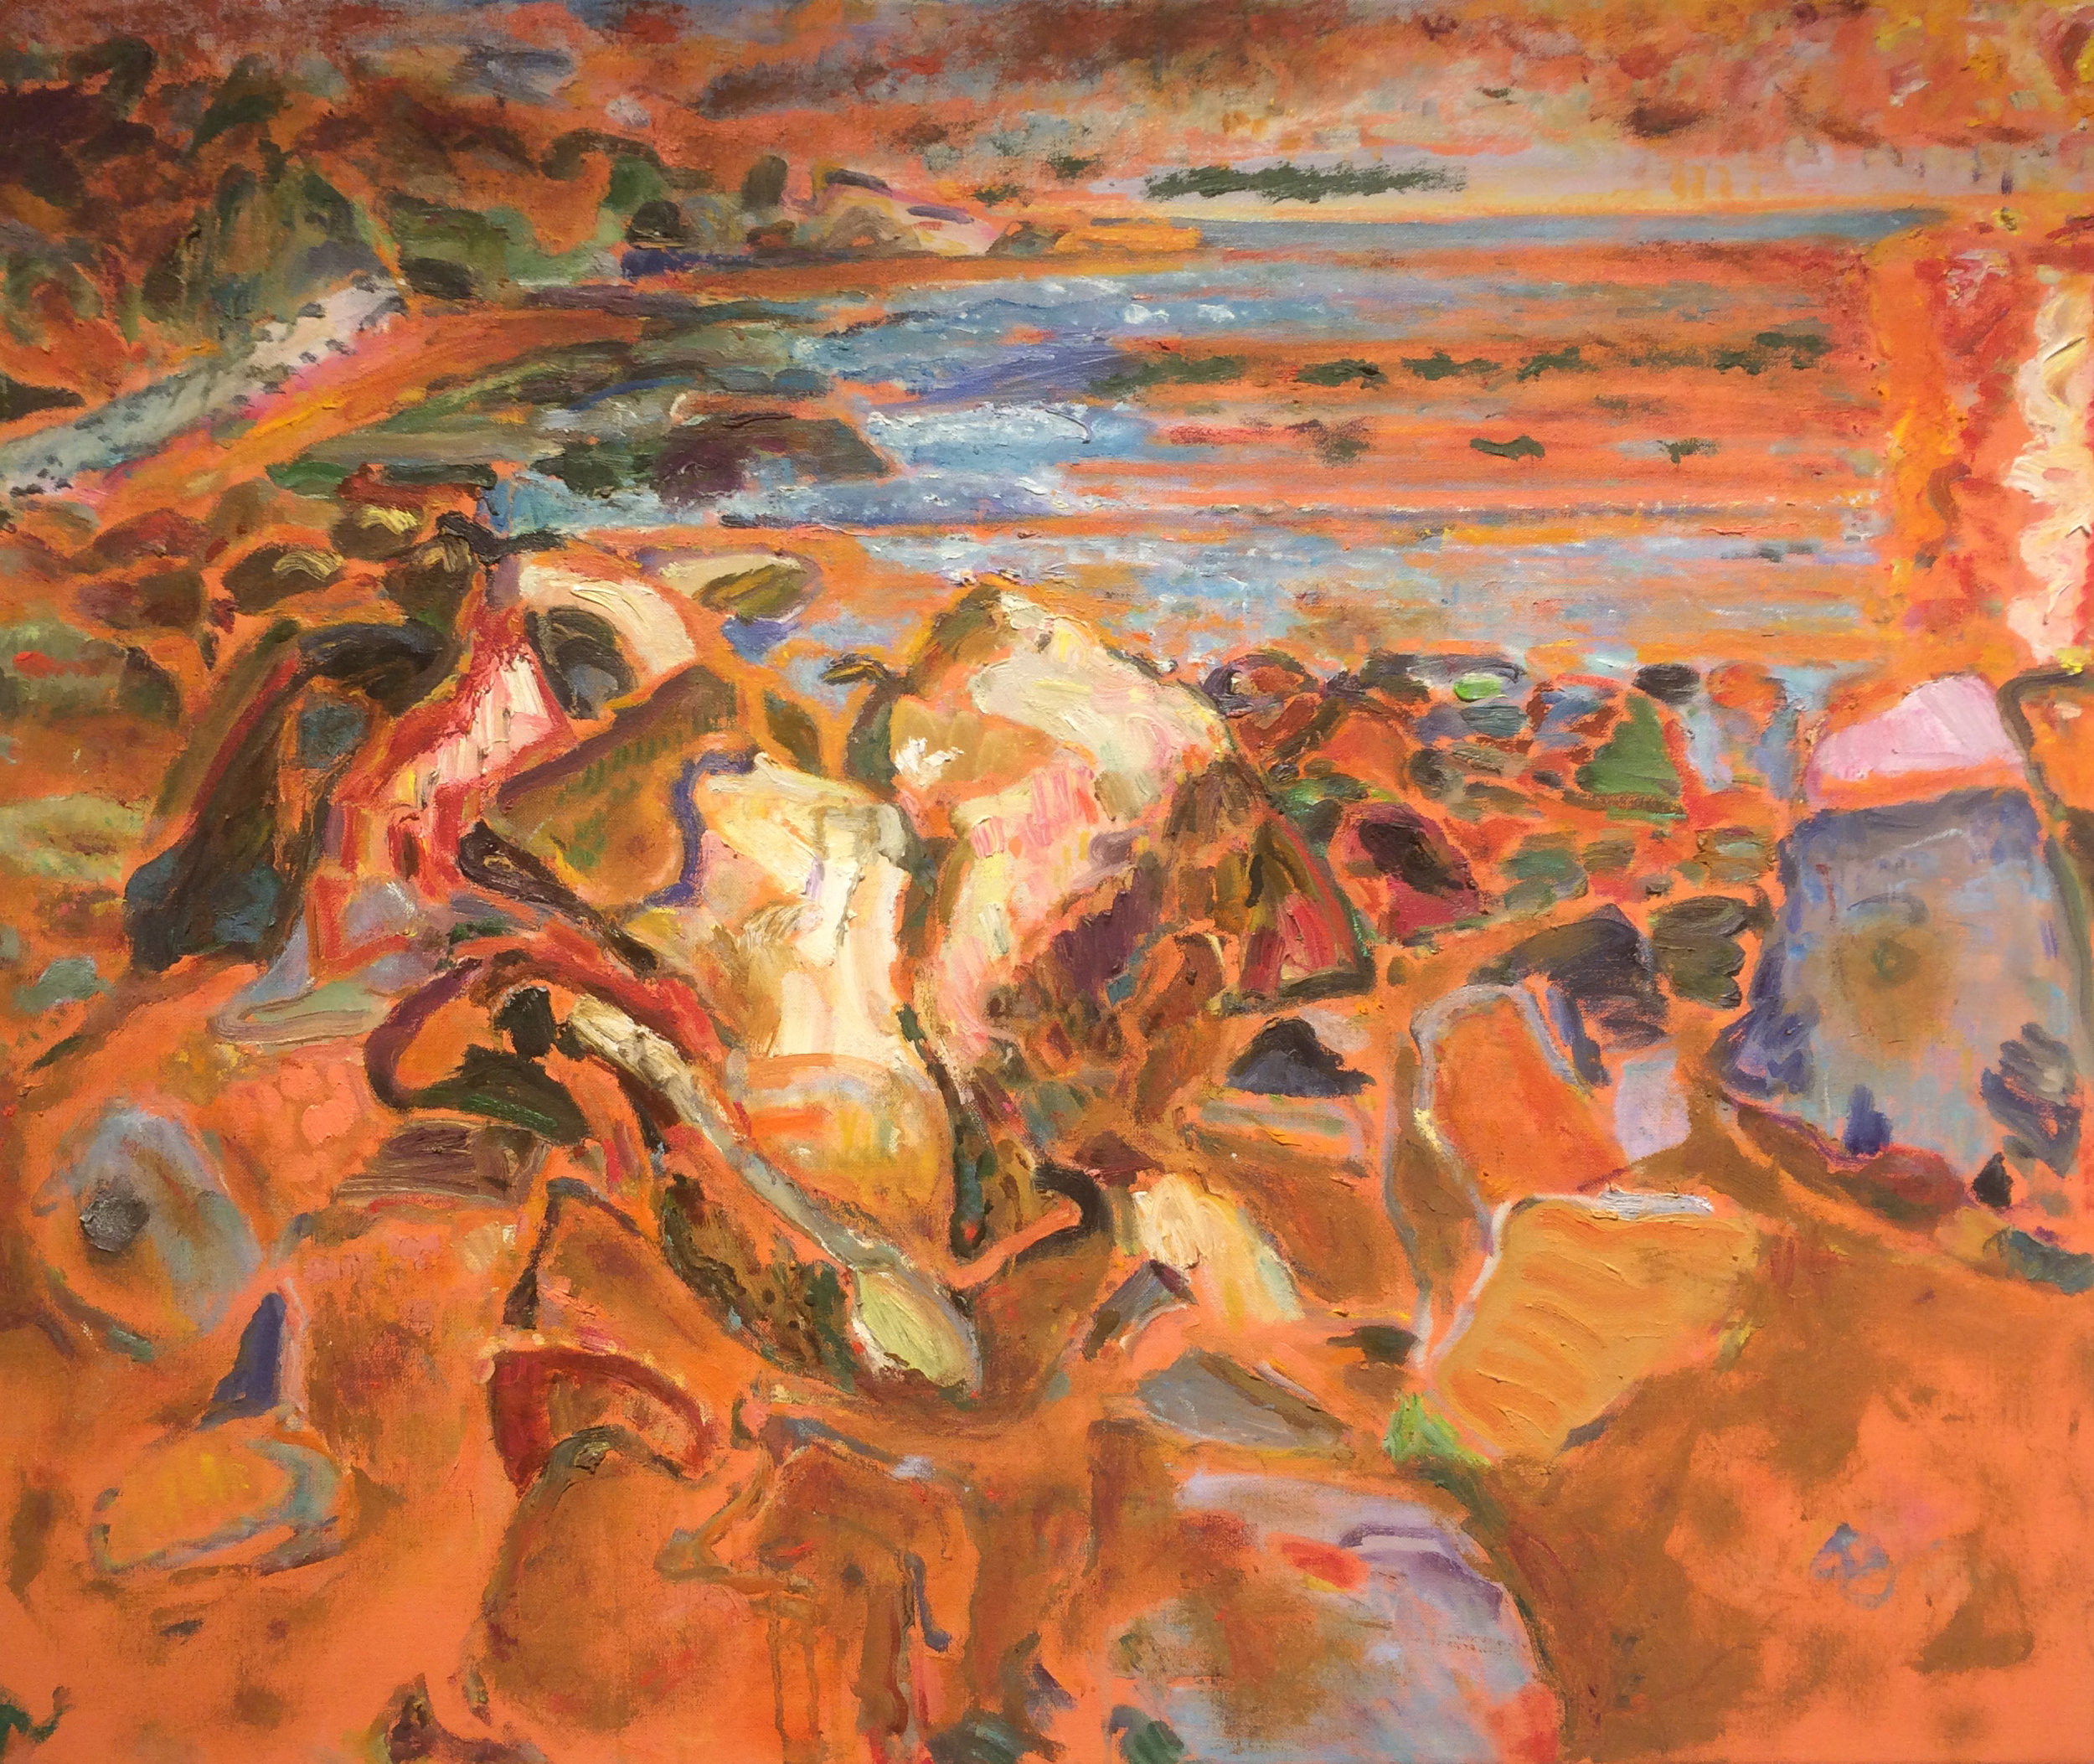 Orange Light,  2006 oil on canvas, 30 x 36 inches